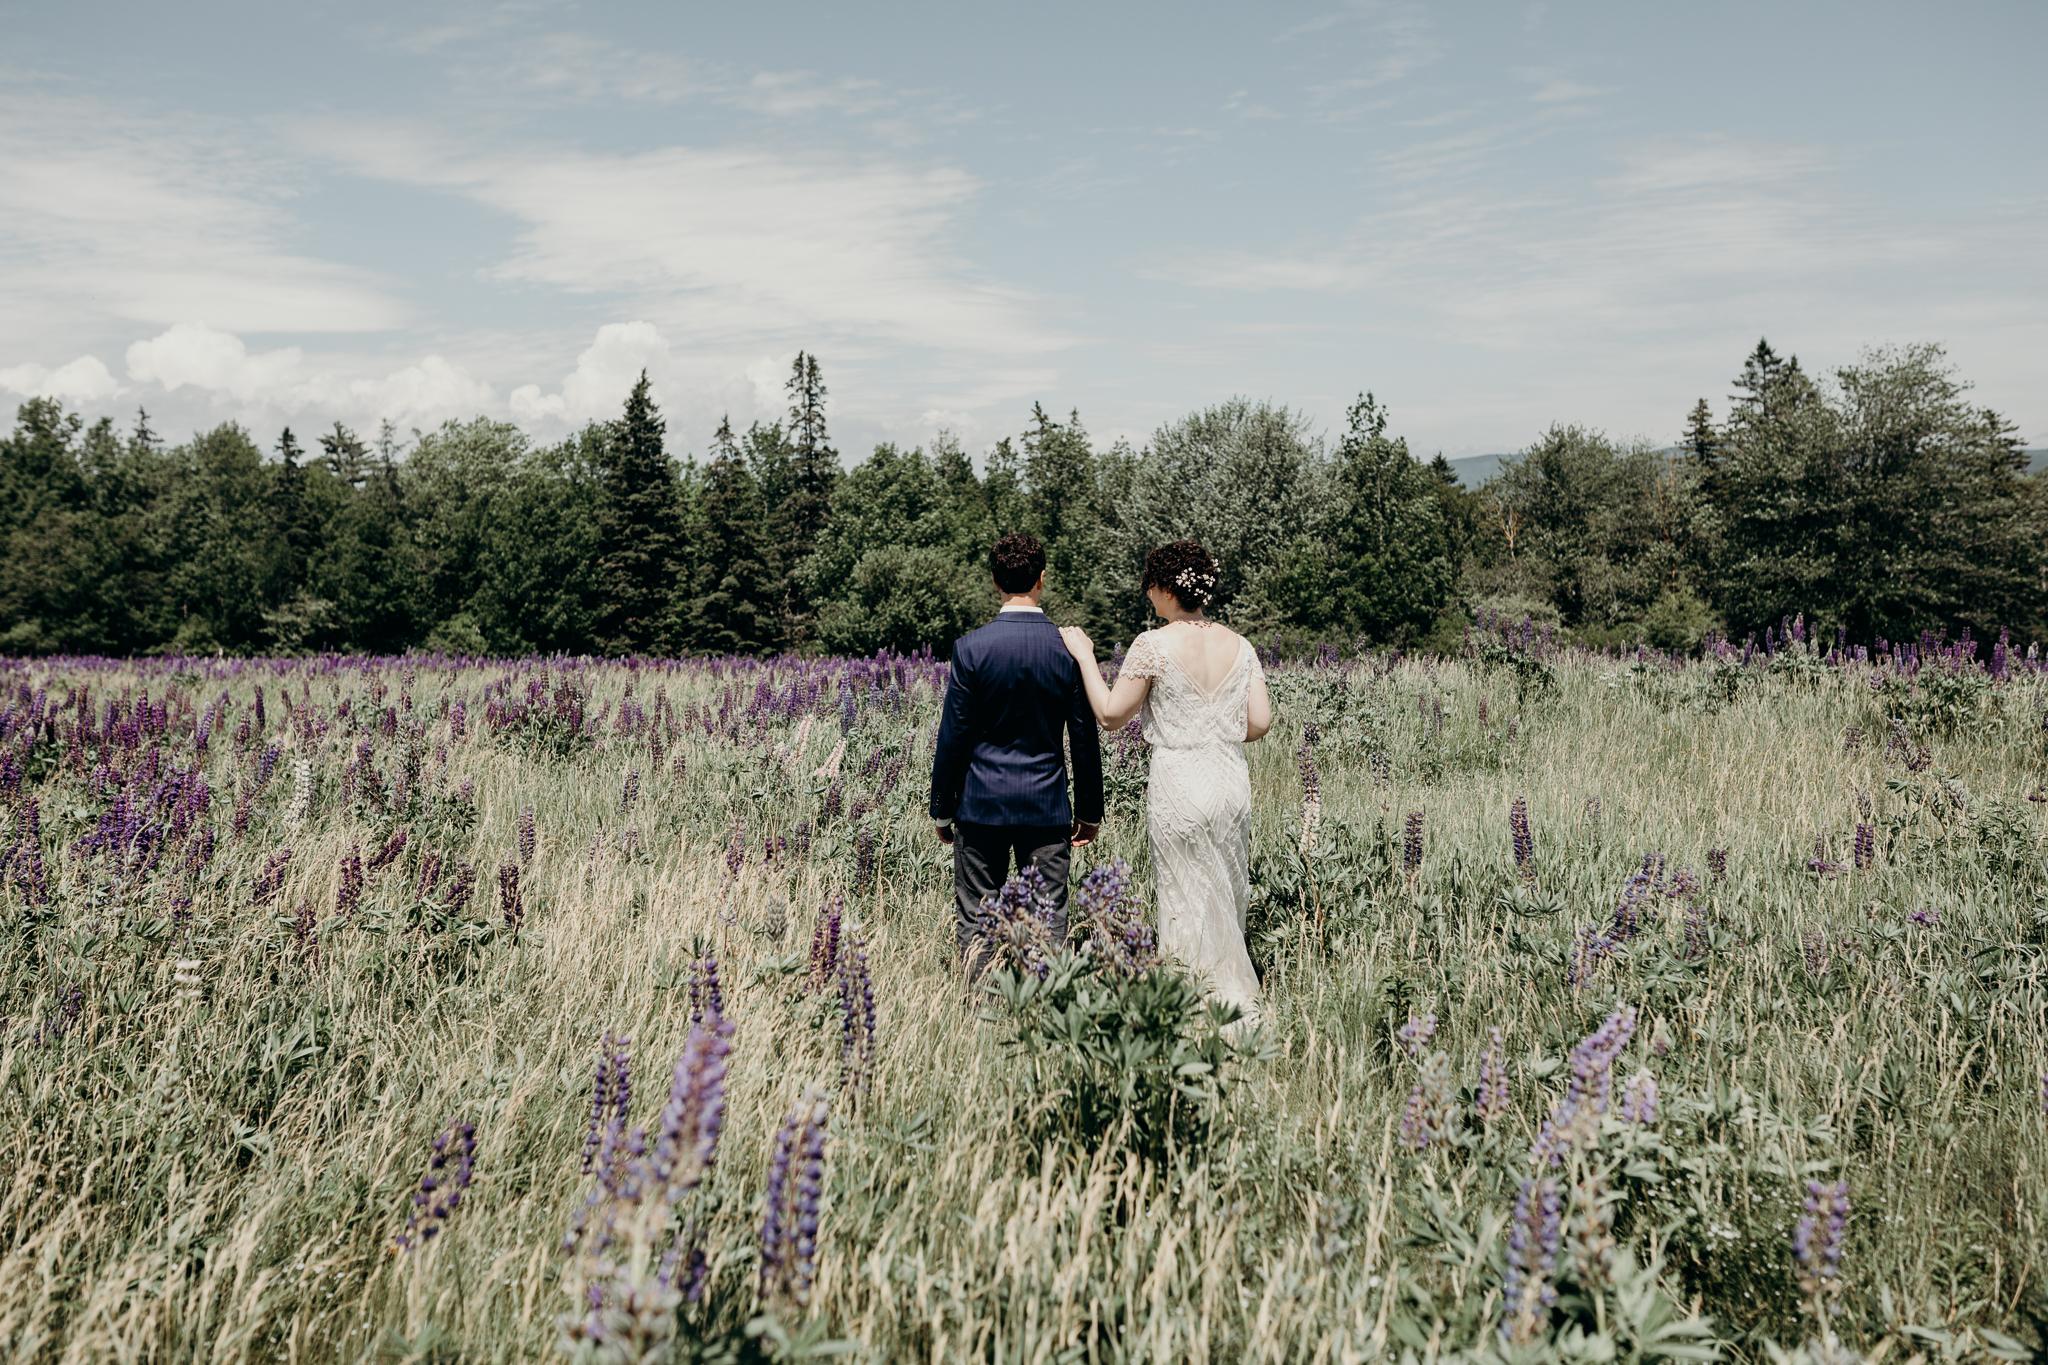 erinwheatco-8973 Maine Wedding by the Sea | Ruth & Ryan